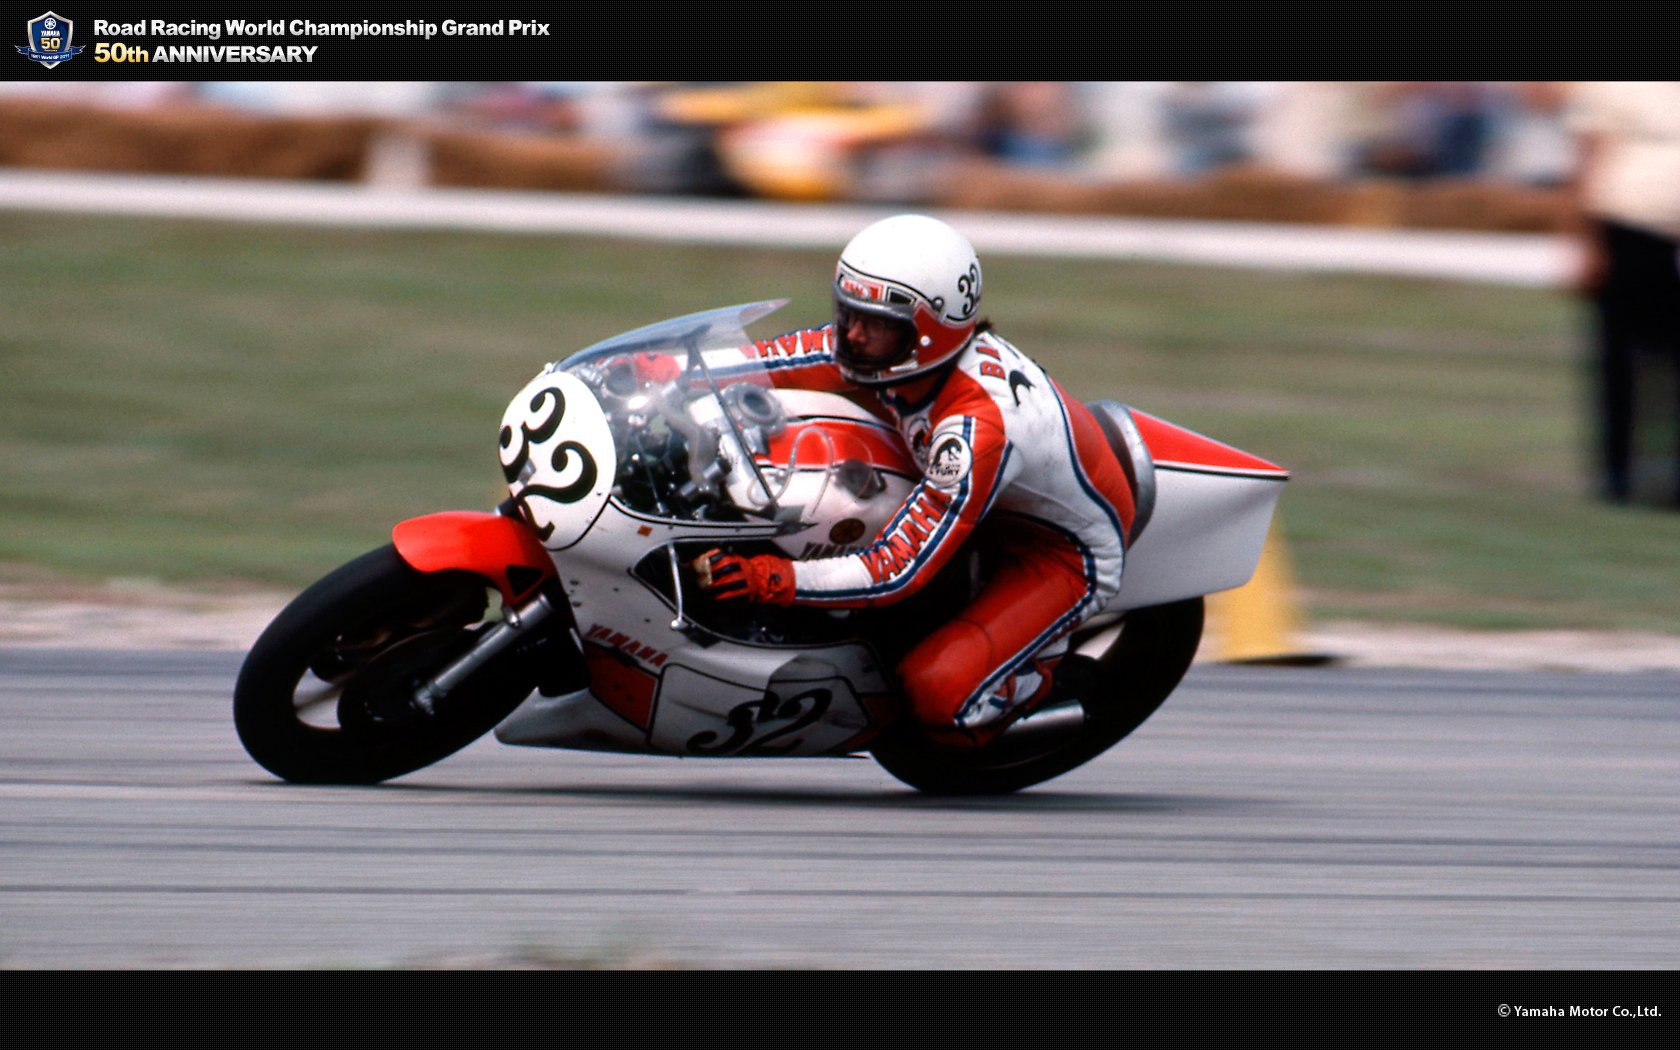 Steve Baker - race | Yamaha Motor Co., Ltd.